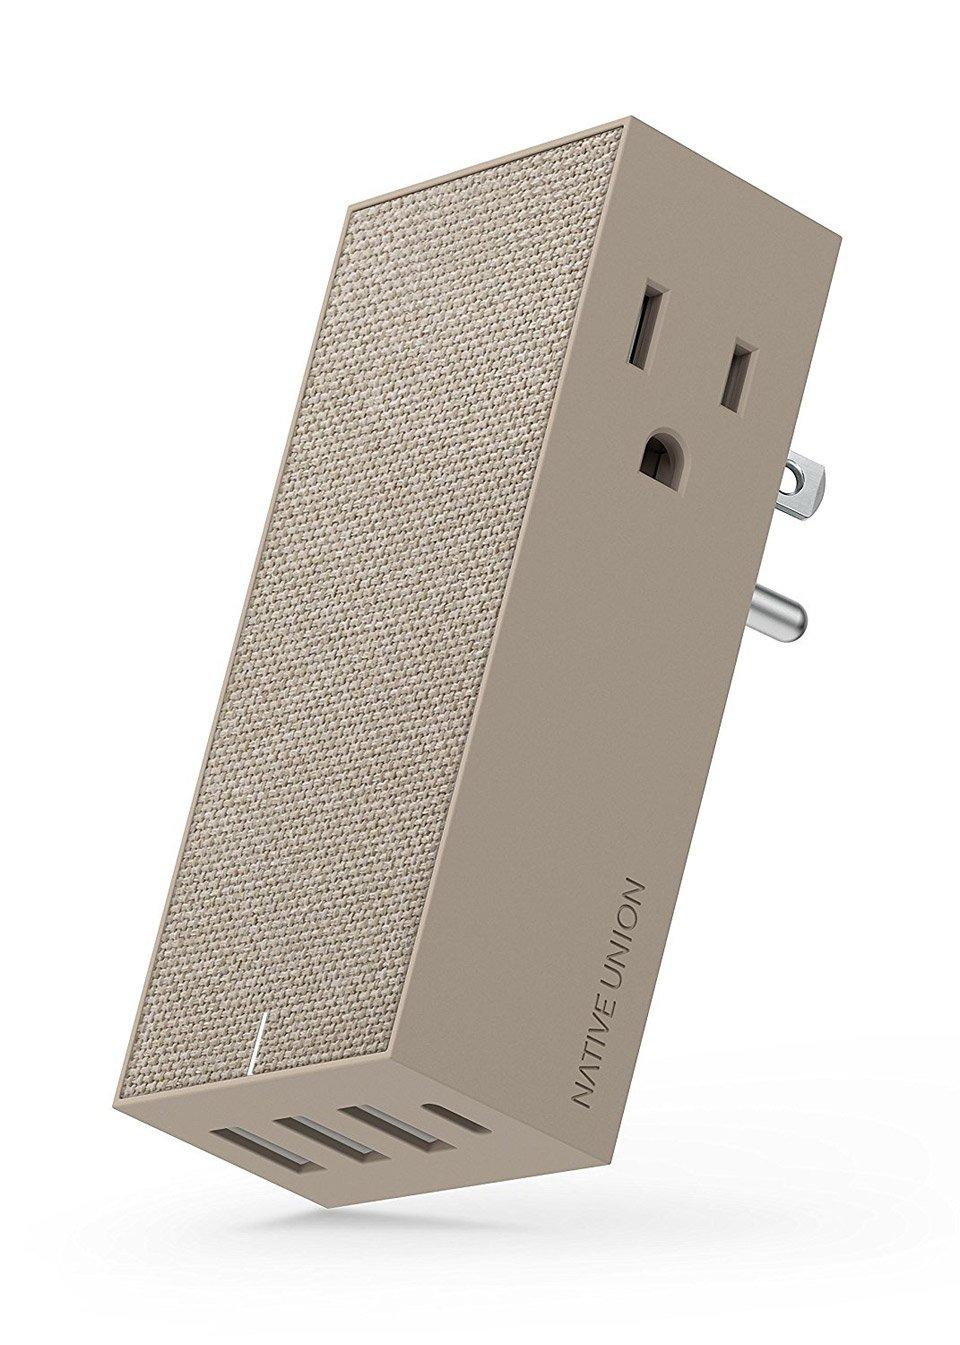 Native Union Smart Hub USB Charger